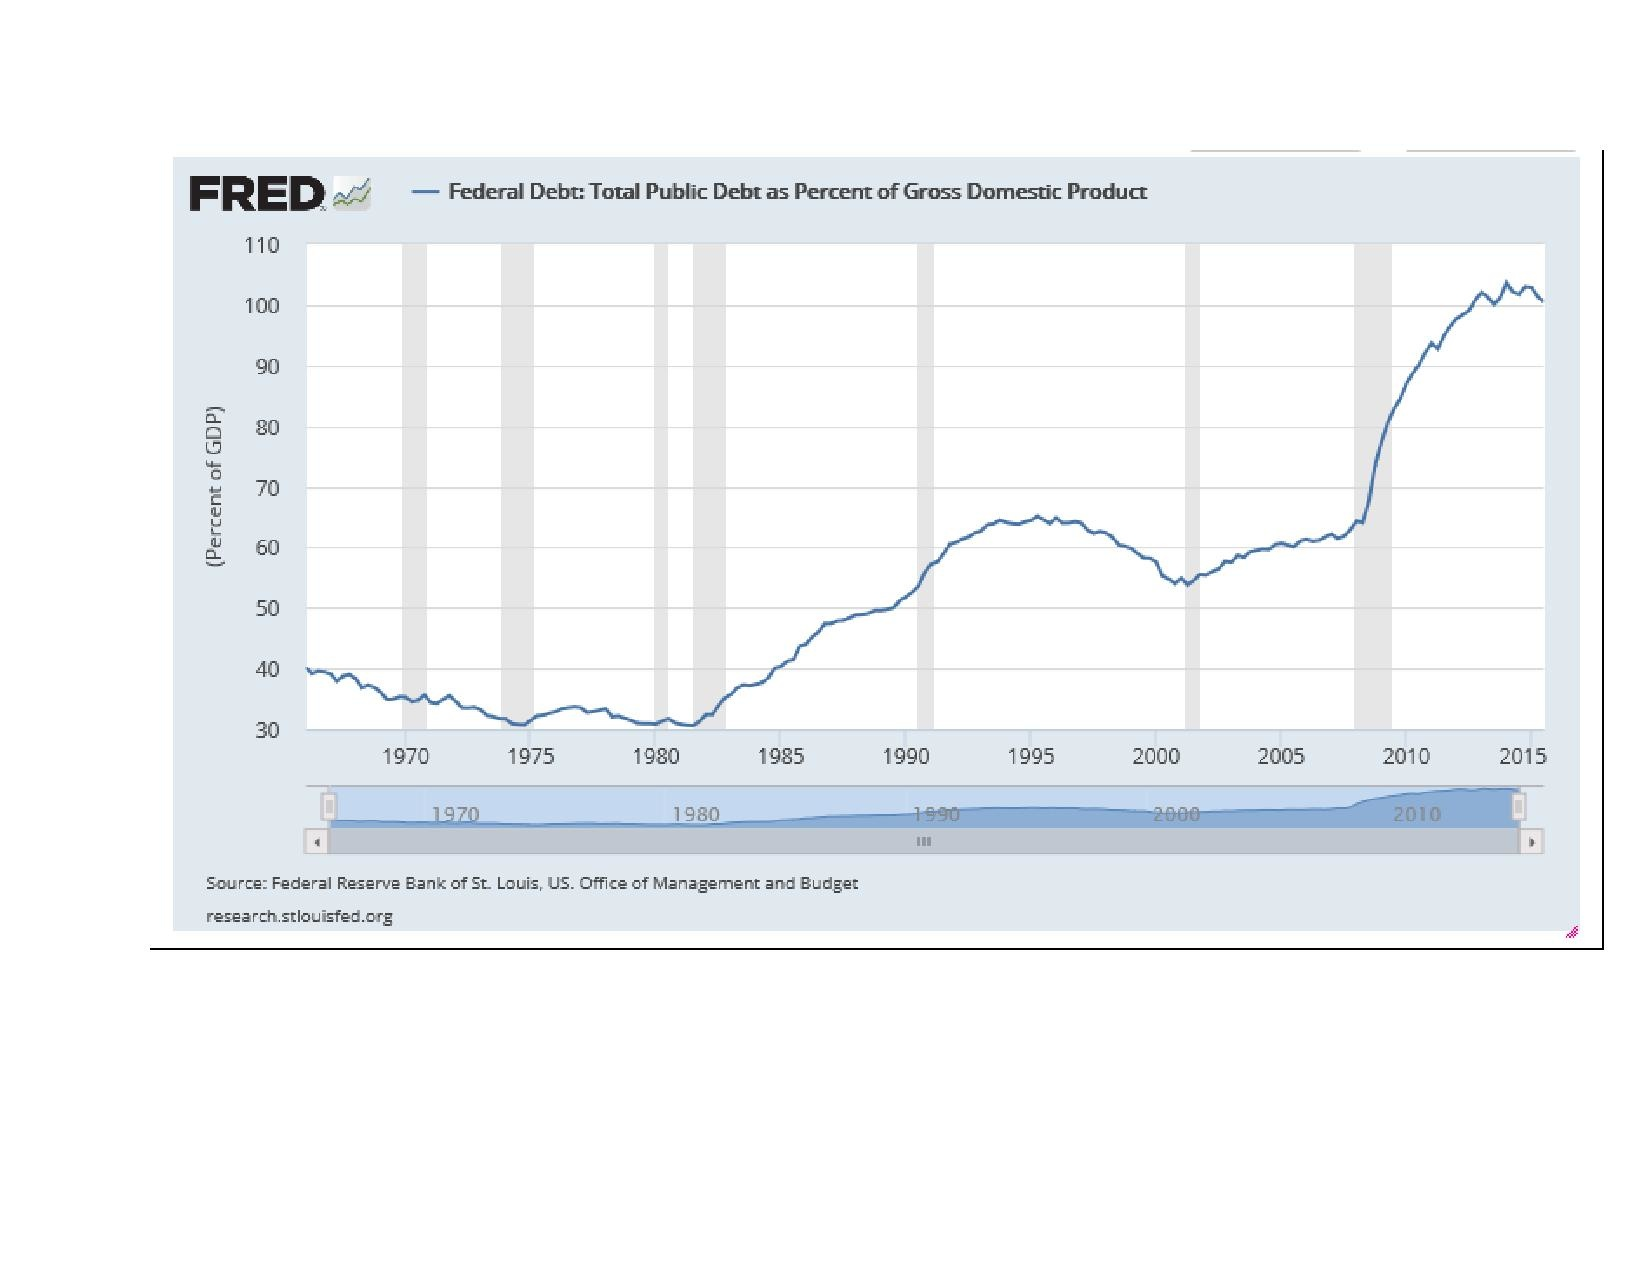 filefederal debt total public debt as percent of gross